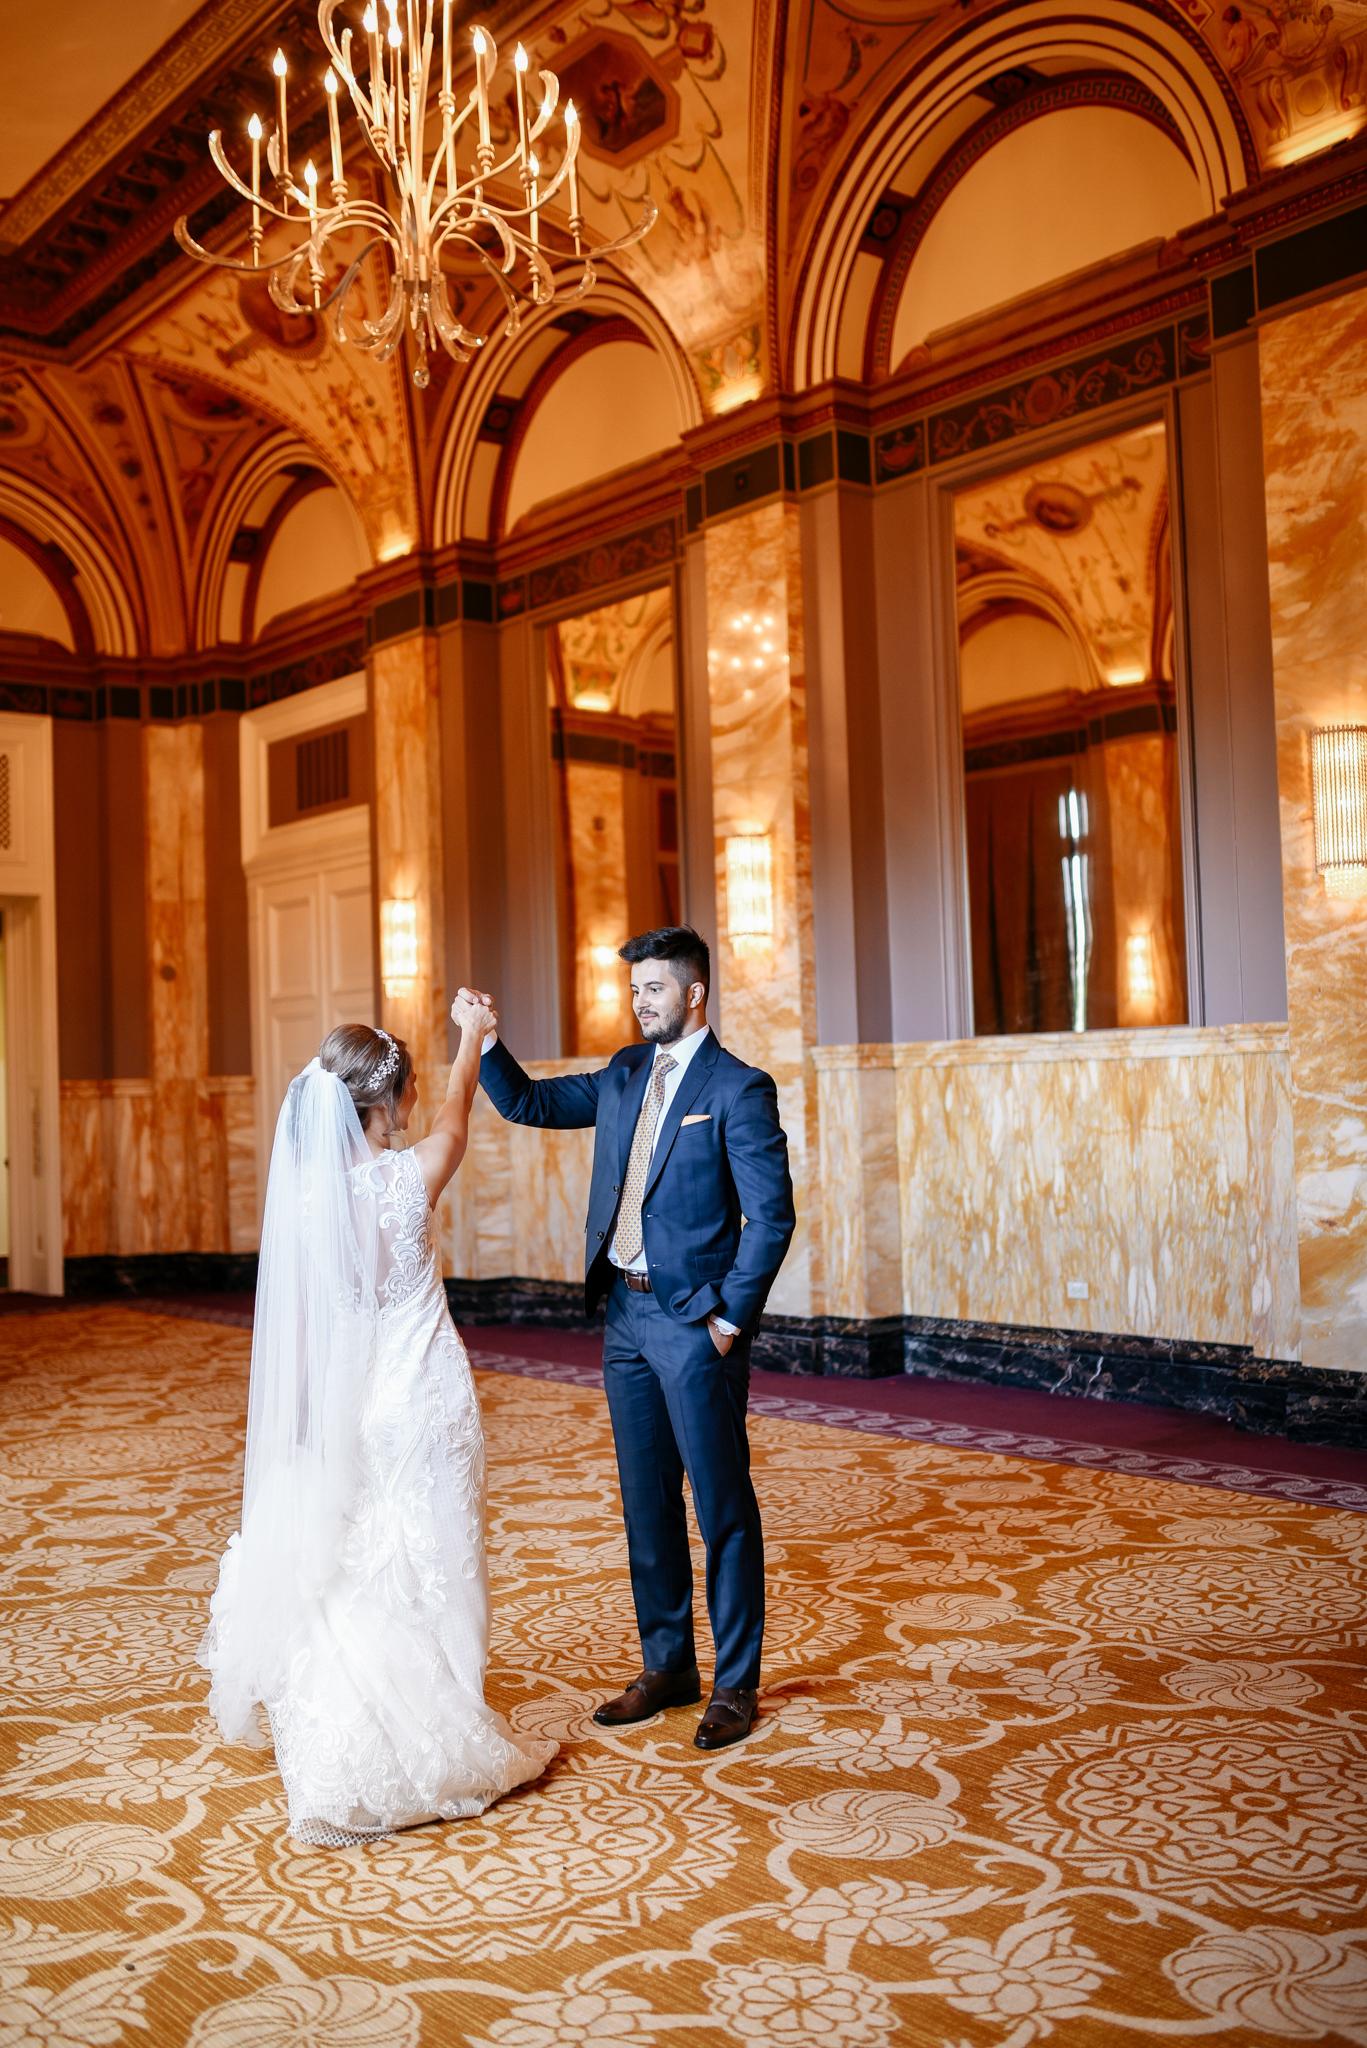 Judy and Theo - Portland Wedding Photographer - 57.jpg